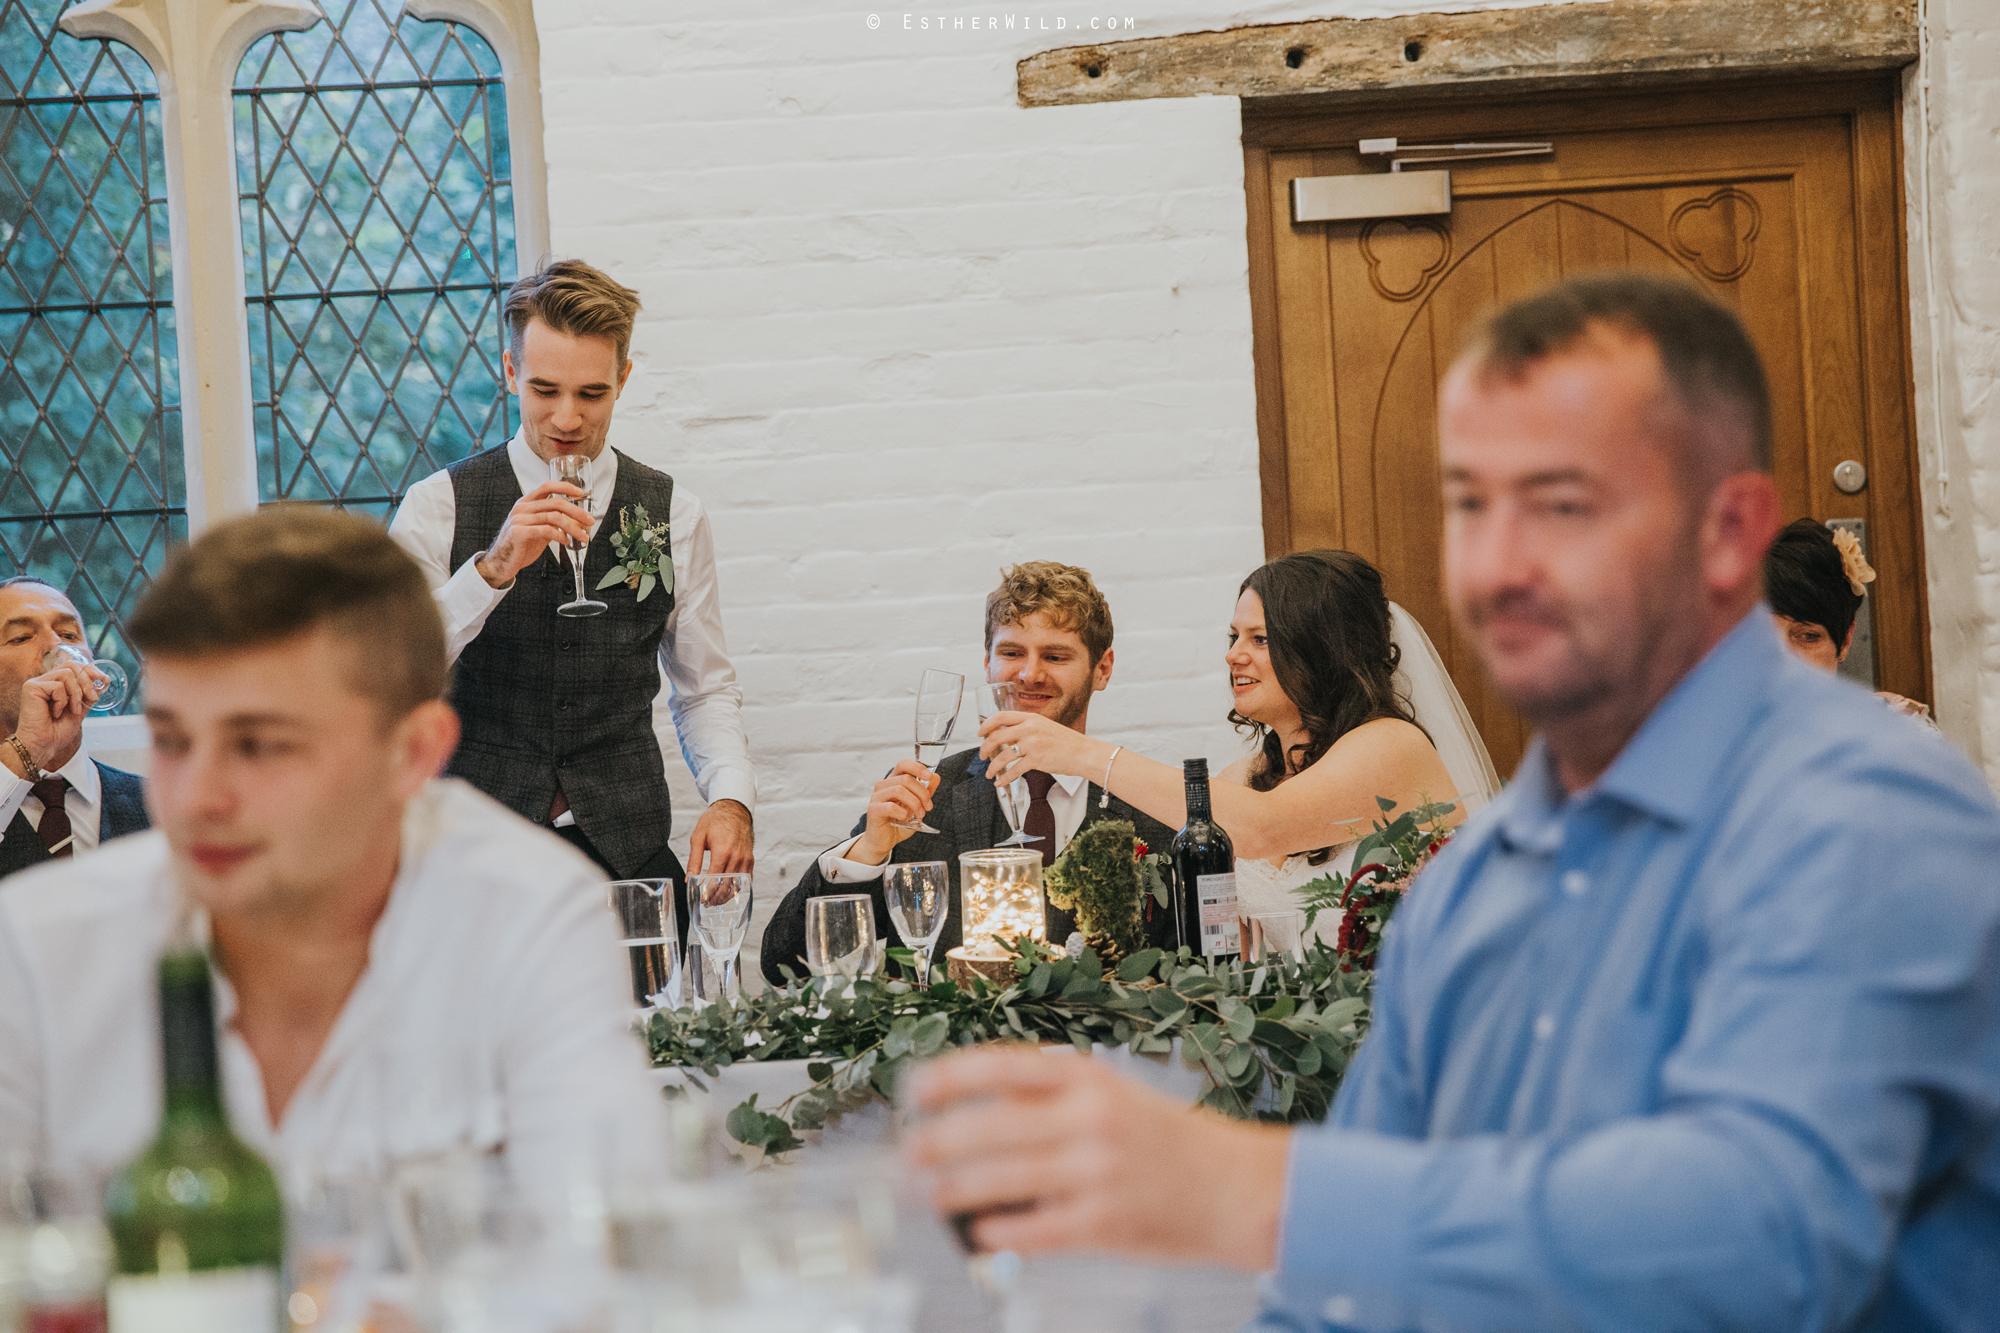 Reading_Room_Weddings_Alby_Norwich_Photographer_Esther_Wild_IMG_2427.jpg